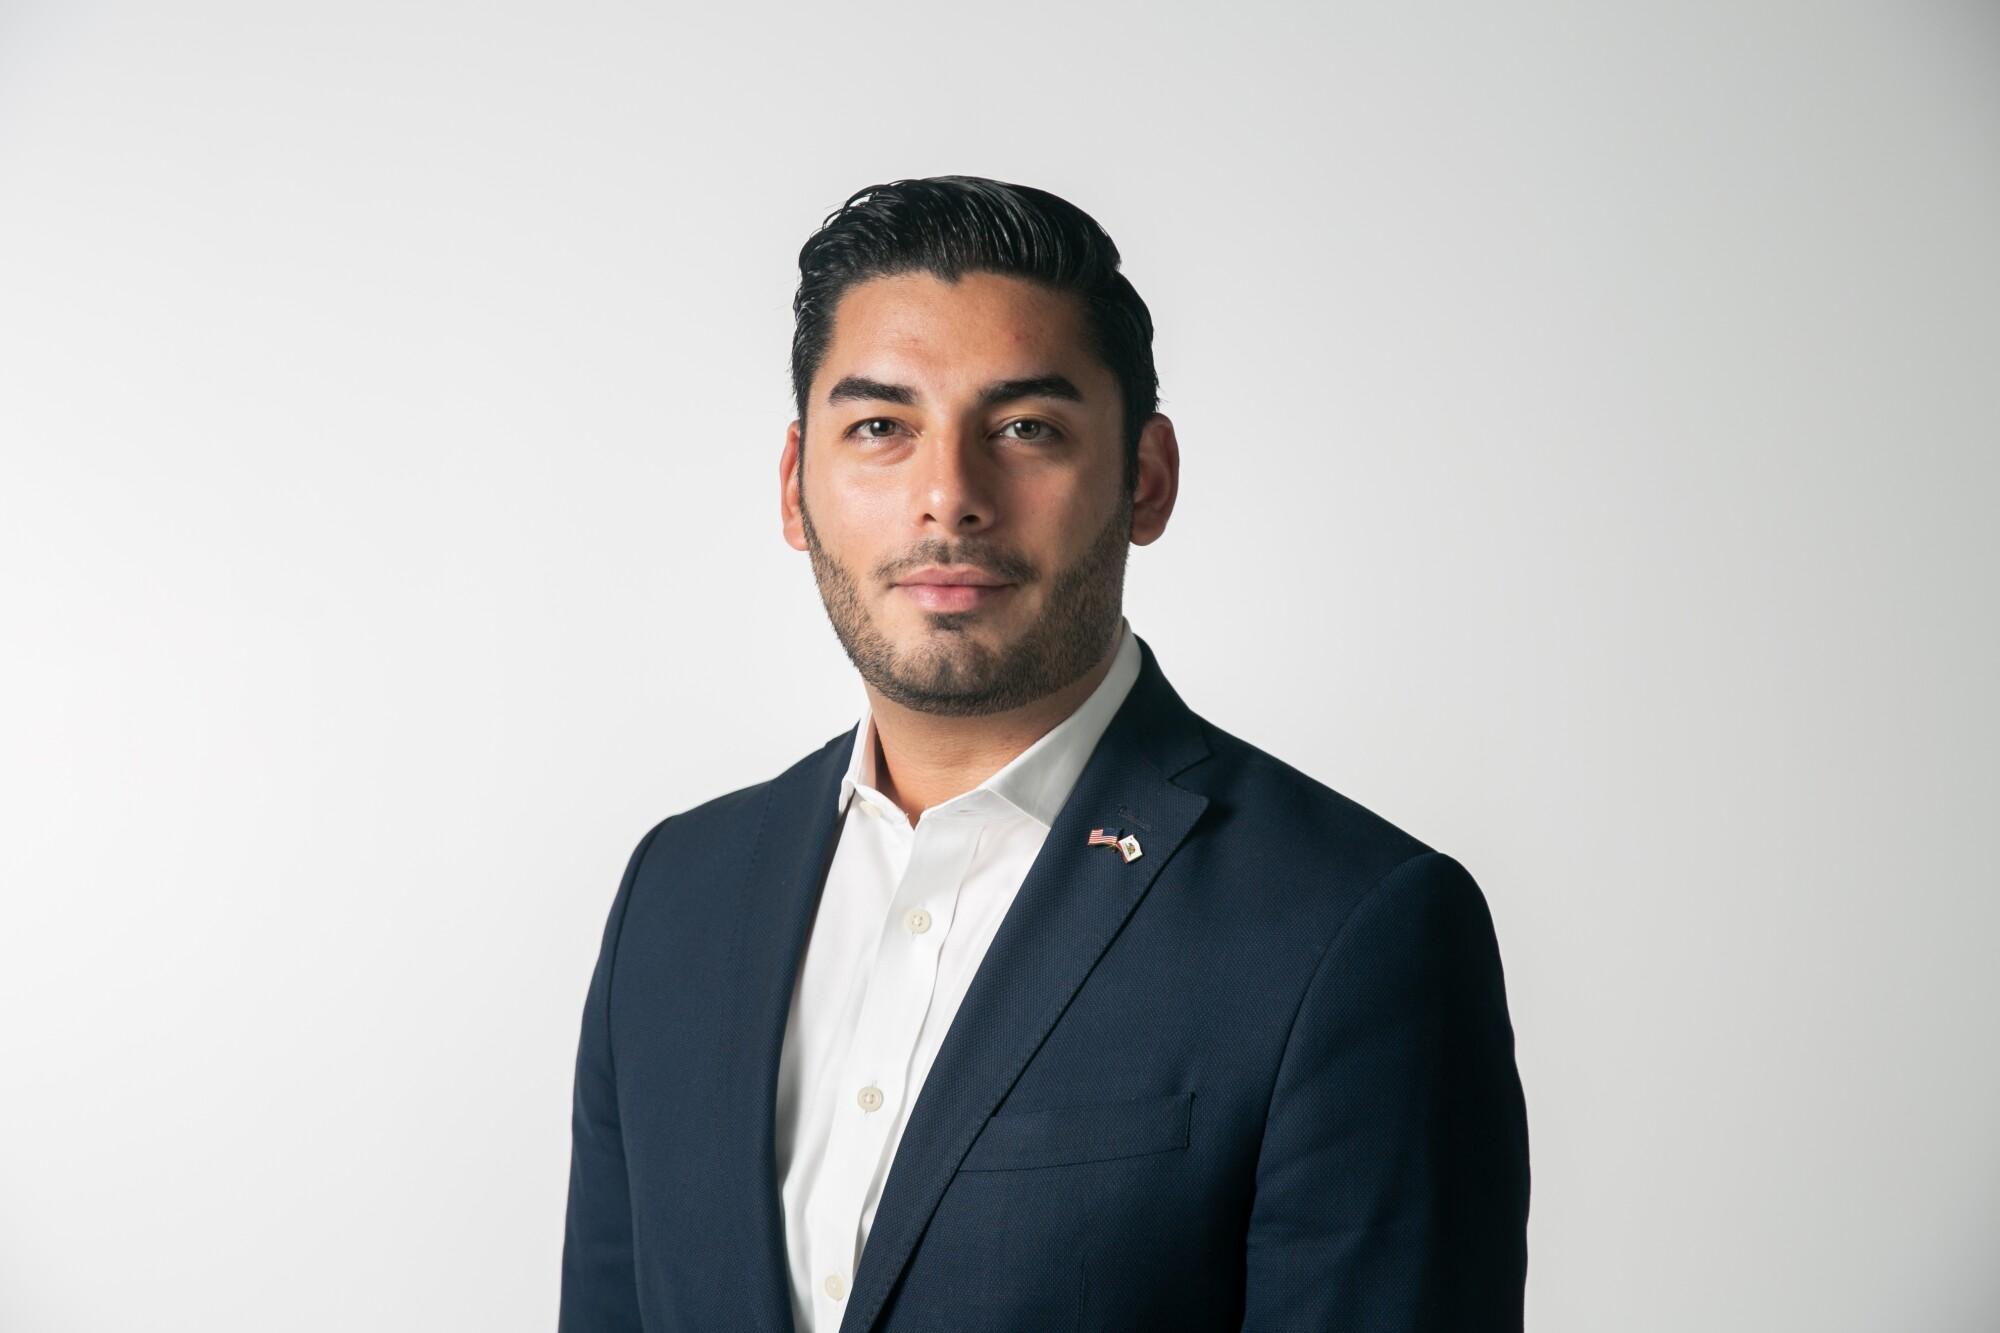 Ammar Campa-Najjar, Democratic candidate in the 50th Congressional District